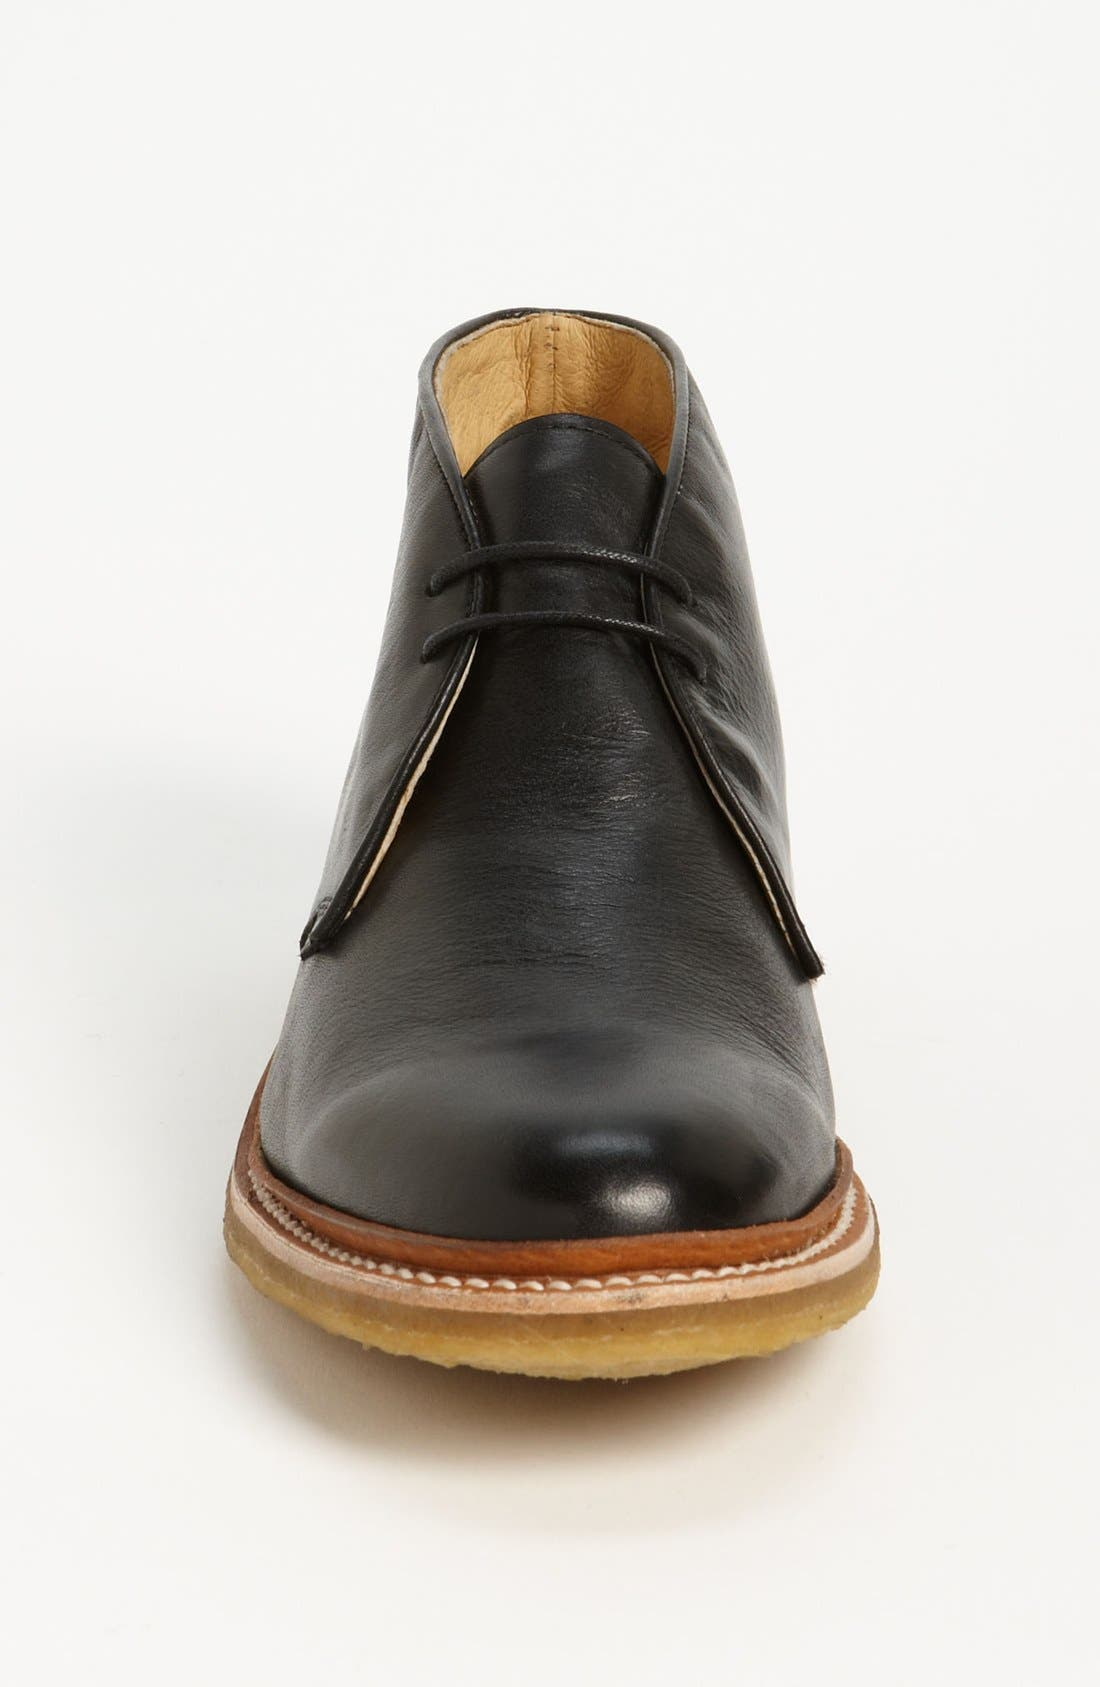 FRYE,                             'James' Chukka Boot,                             Alternate thumbnail 4, color,                             001